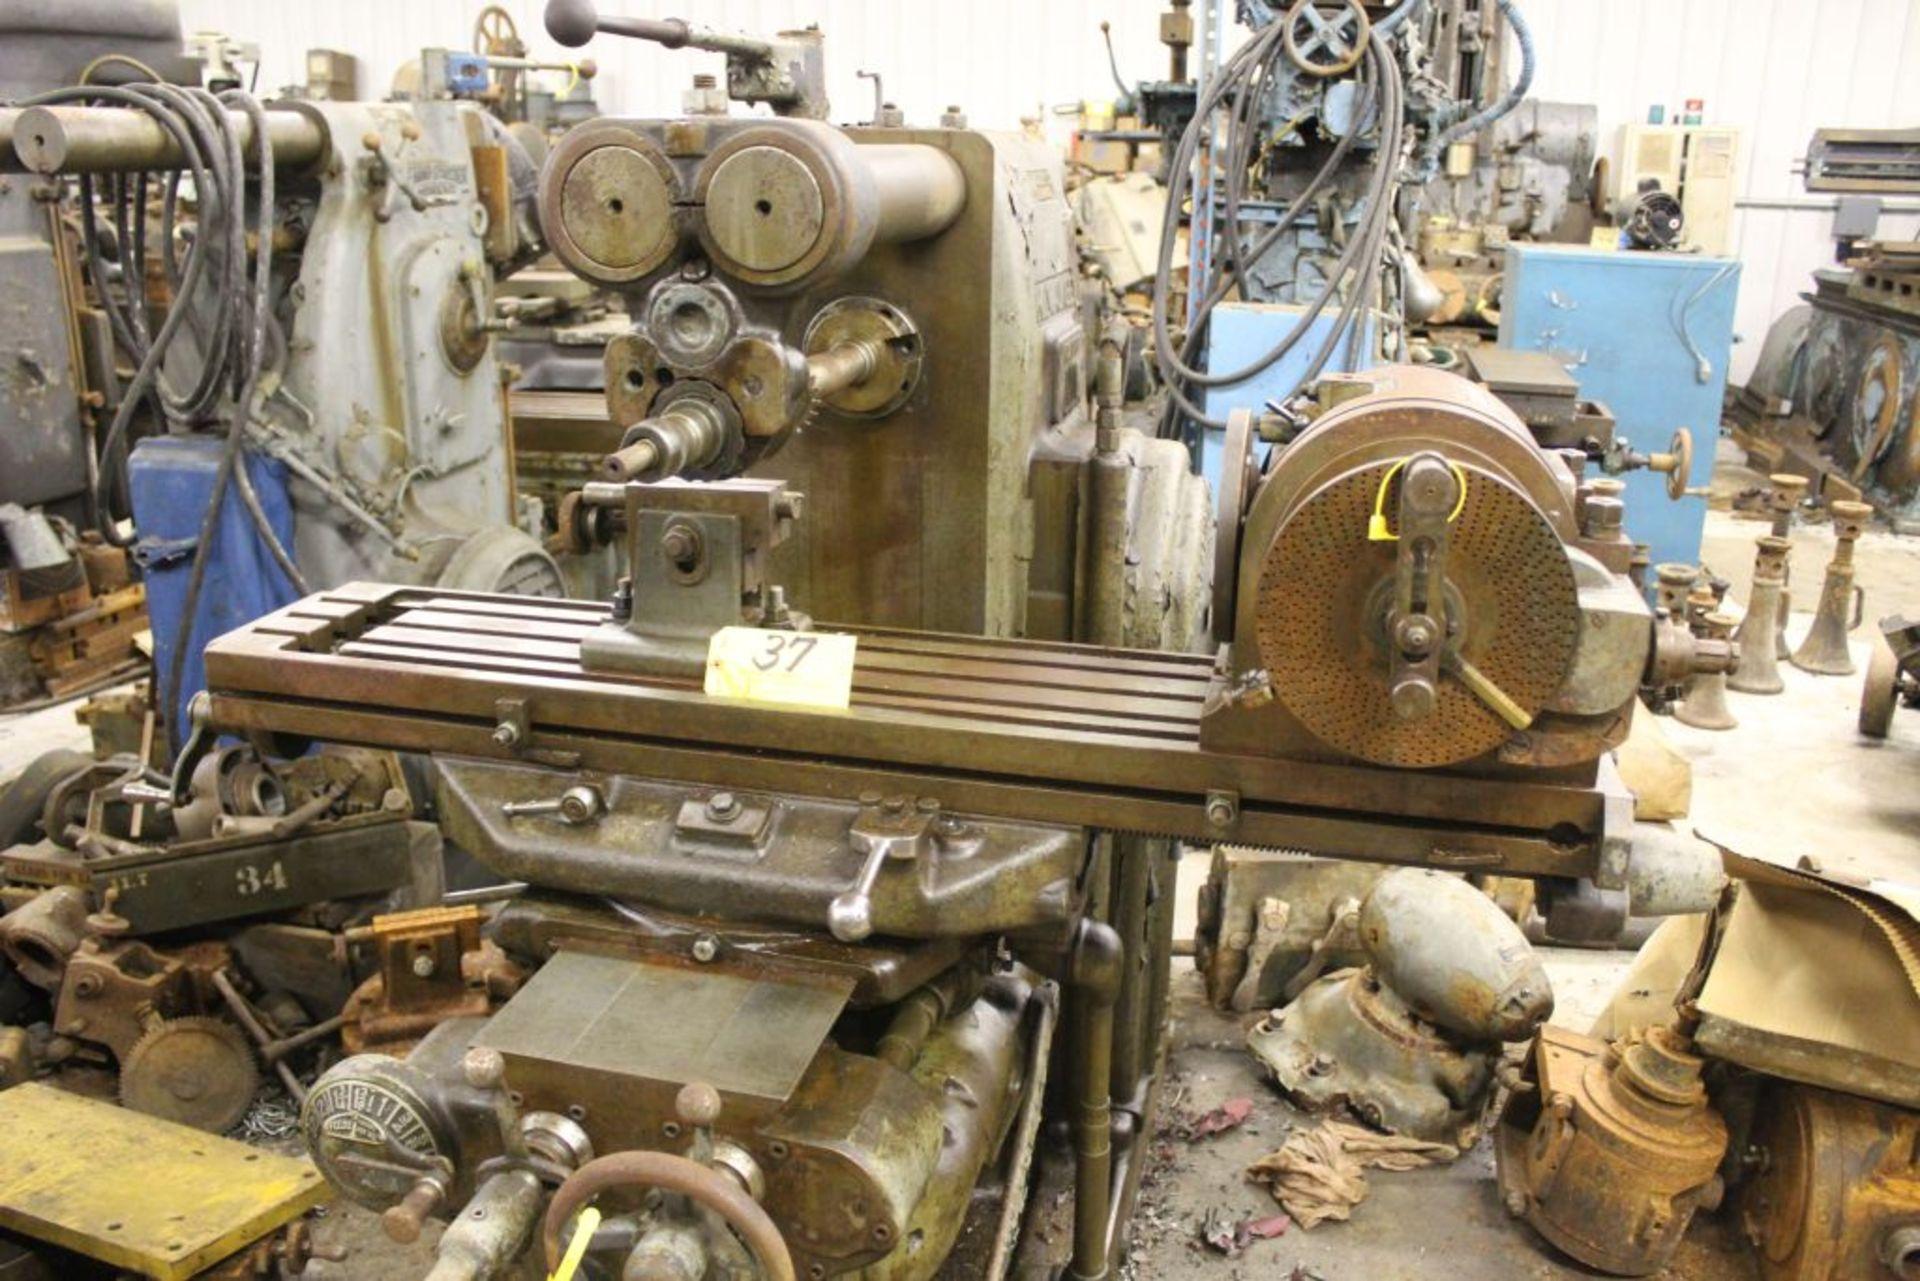 "Milwaukee mill model H, sn 3596, 51"" x 10"" bed, horz. Boring mill."